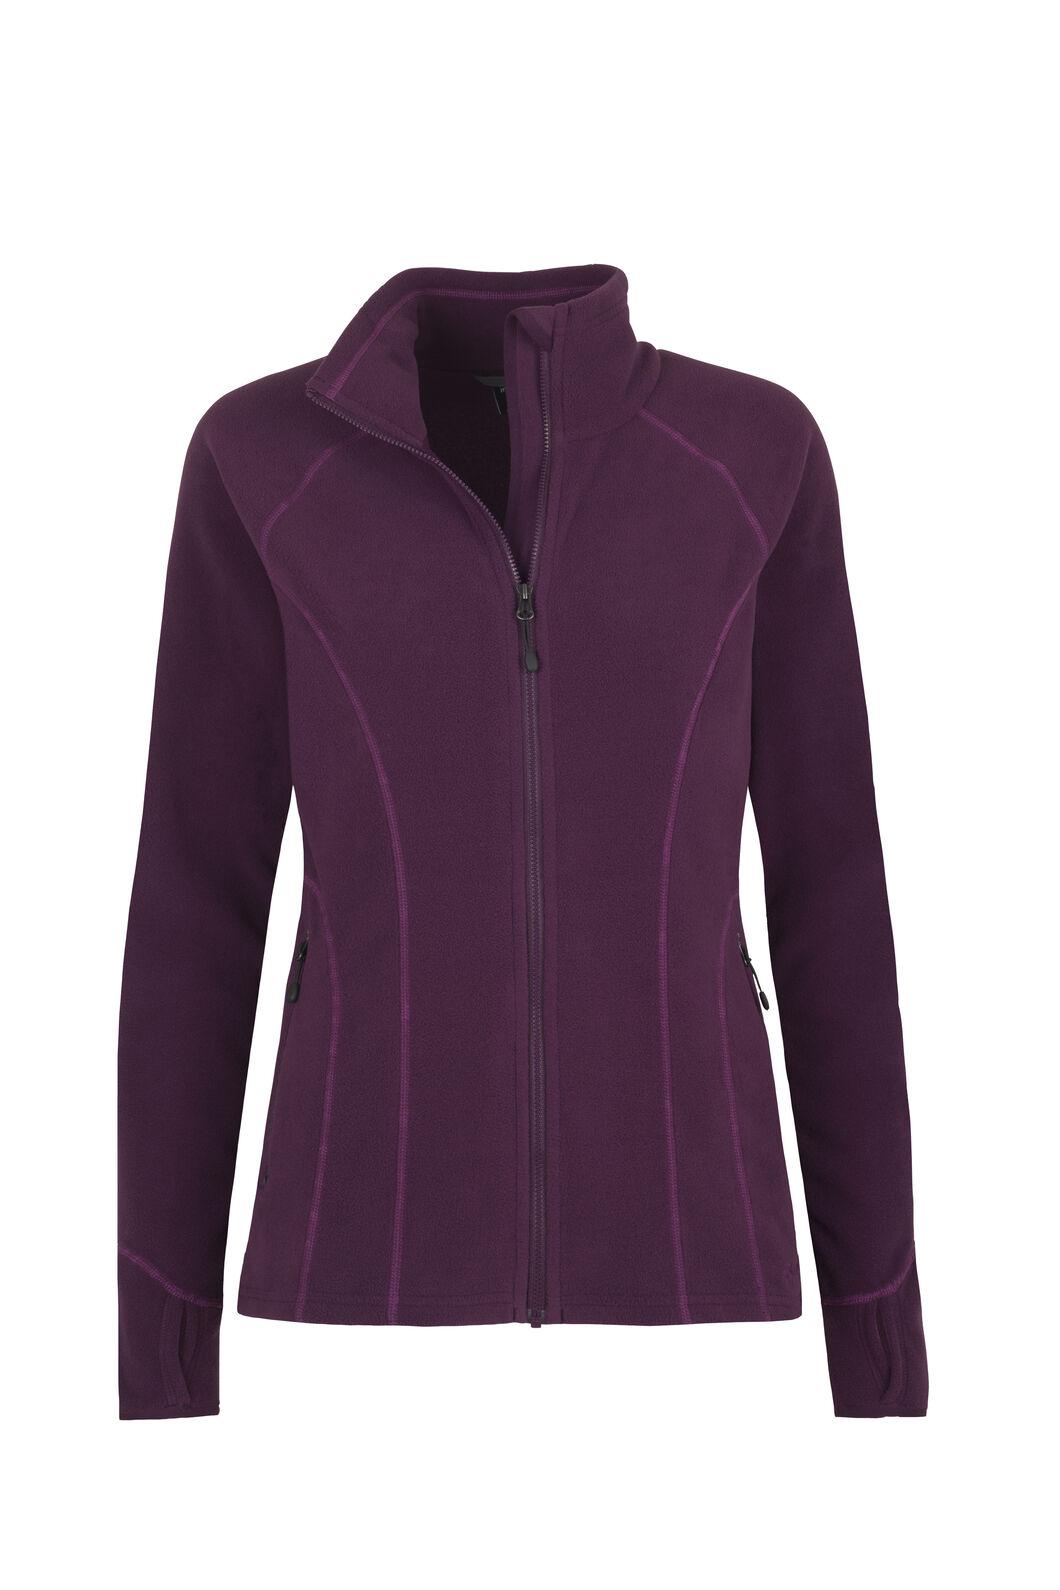 Macpac Kea Polartec 174 Micro Fleece 174 Jacket Women S